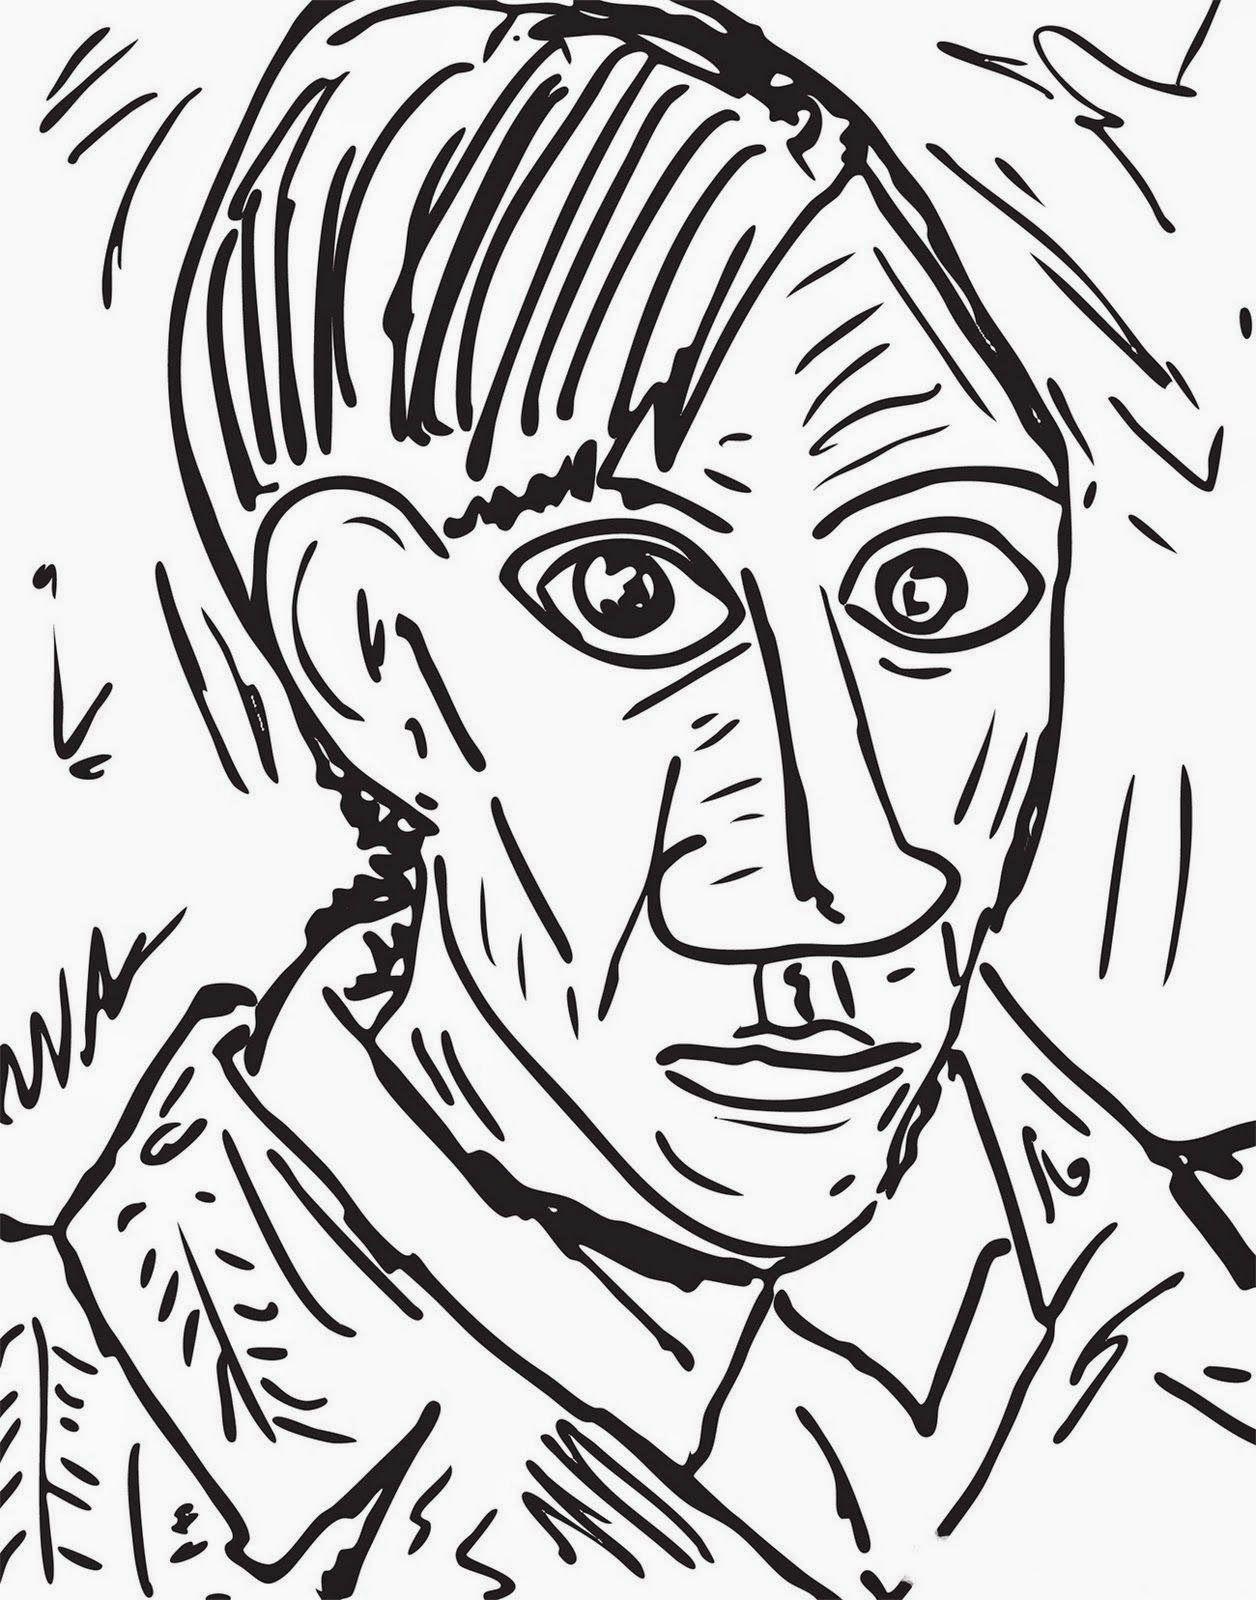 Pintores famosos Pablo Picasso